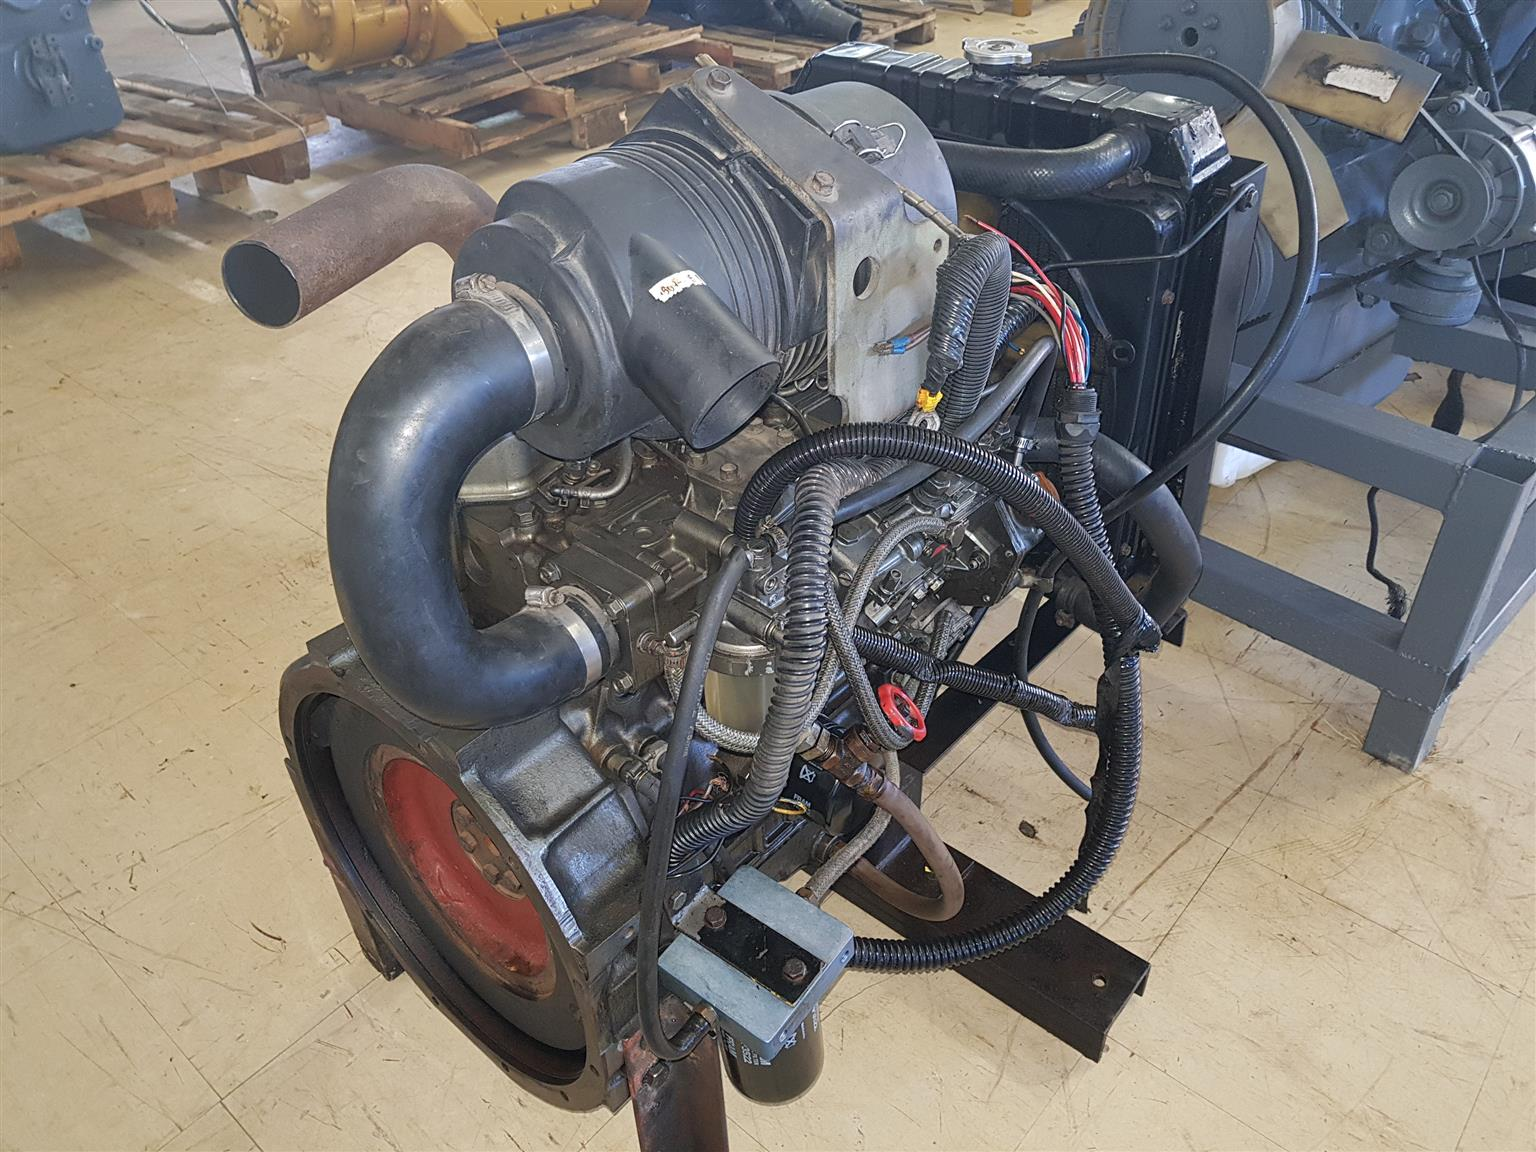 Excavator Yanmar 4TNE88 Diesel Engine | Junk Mail